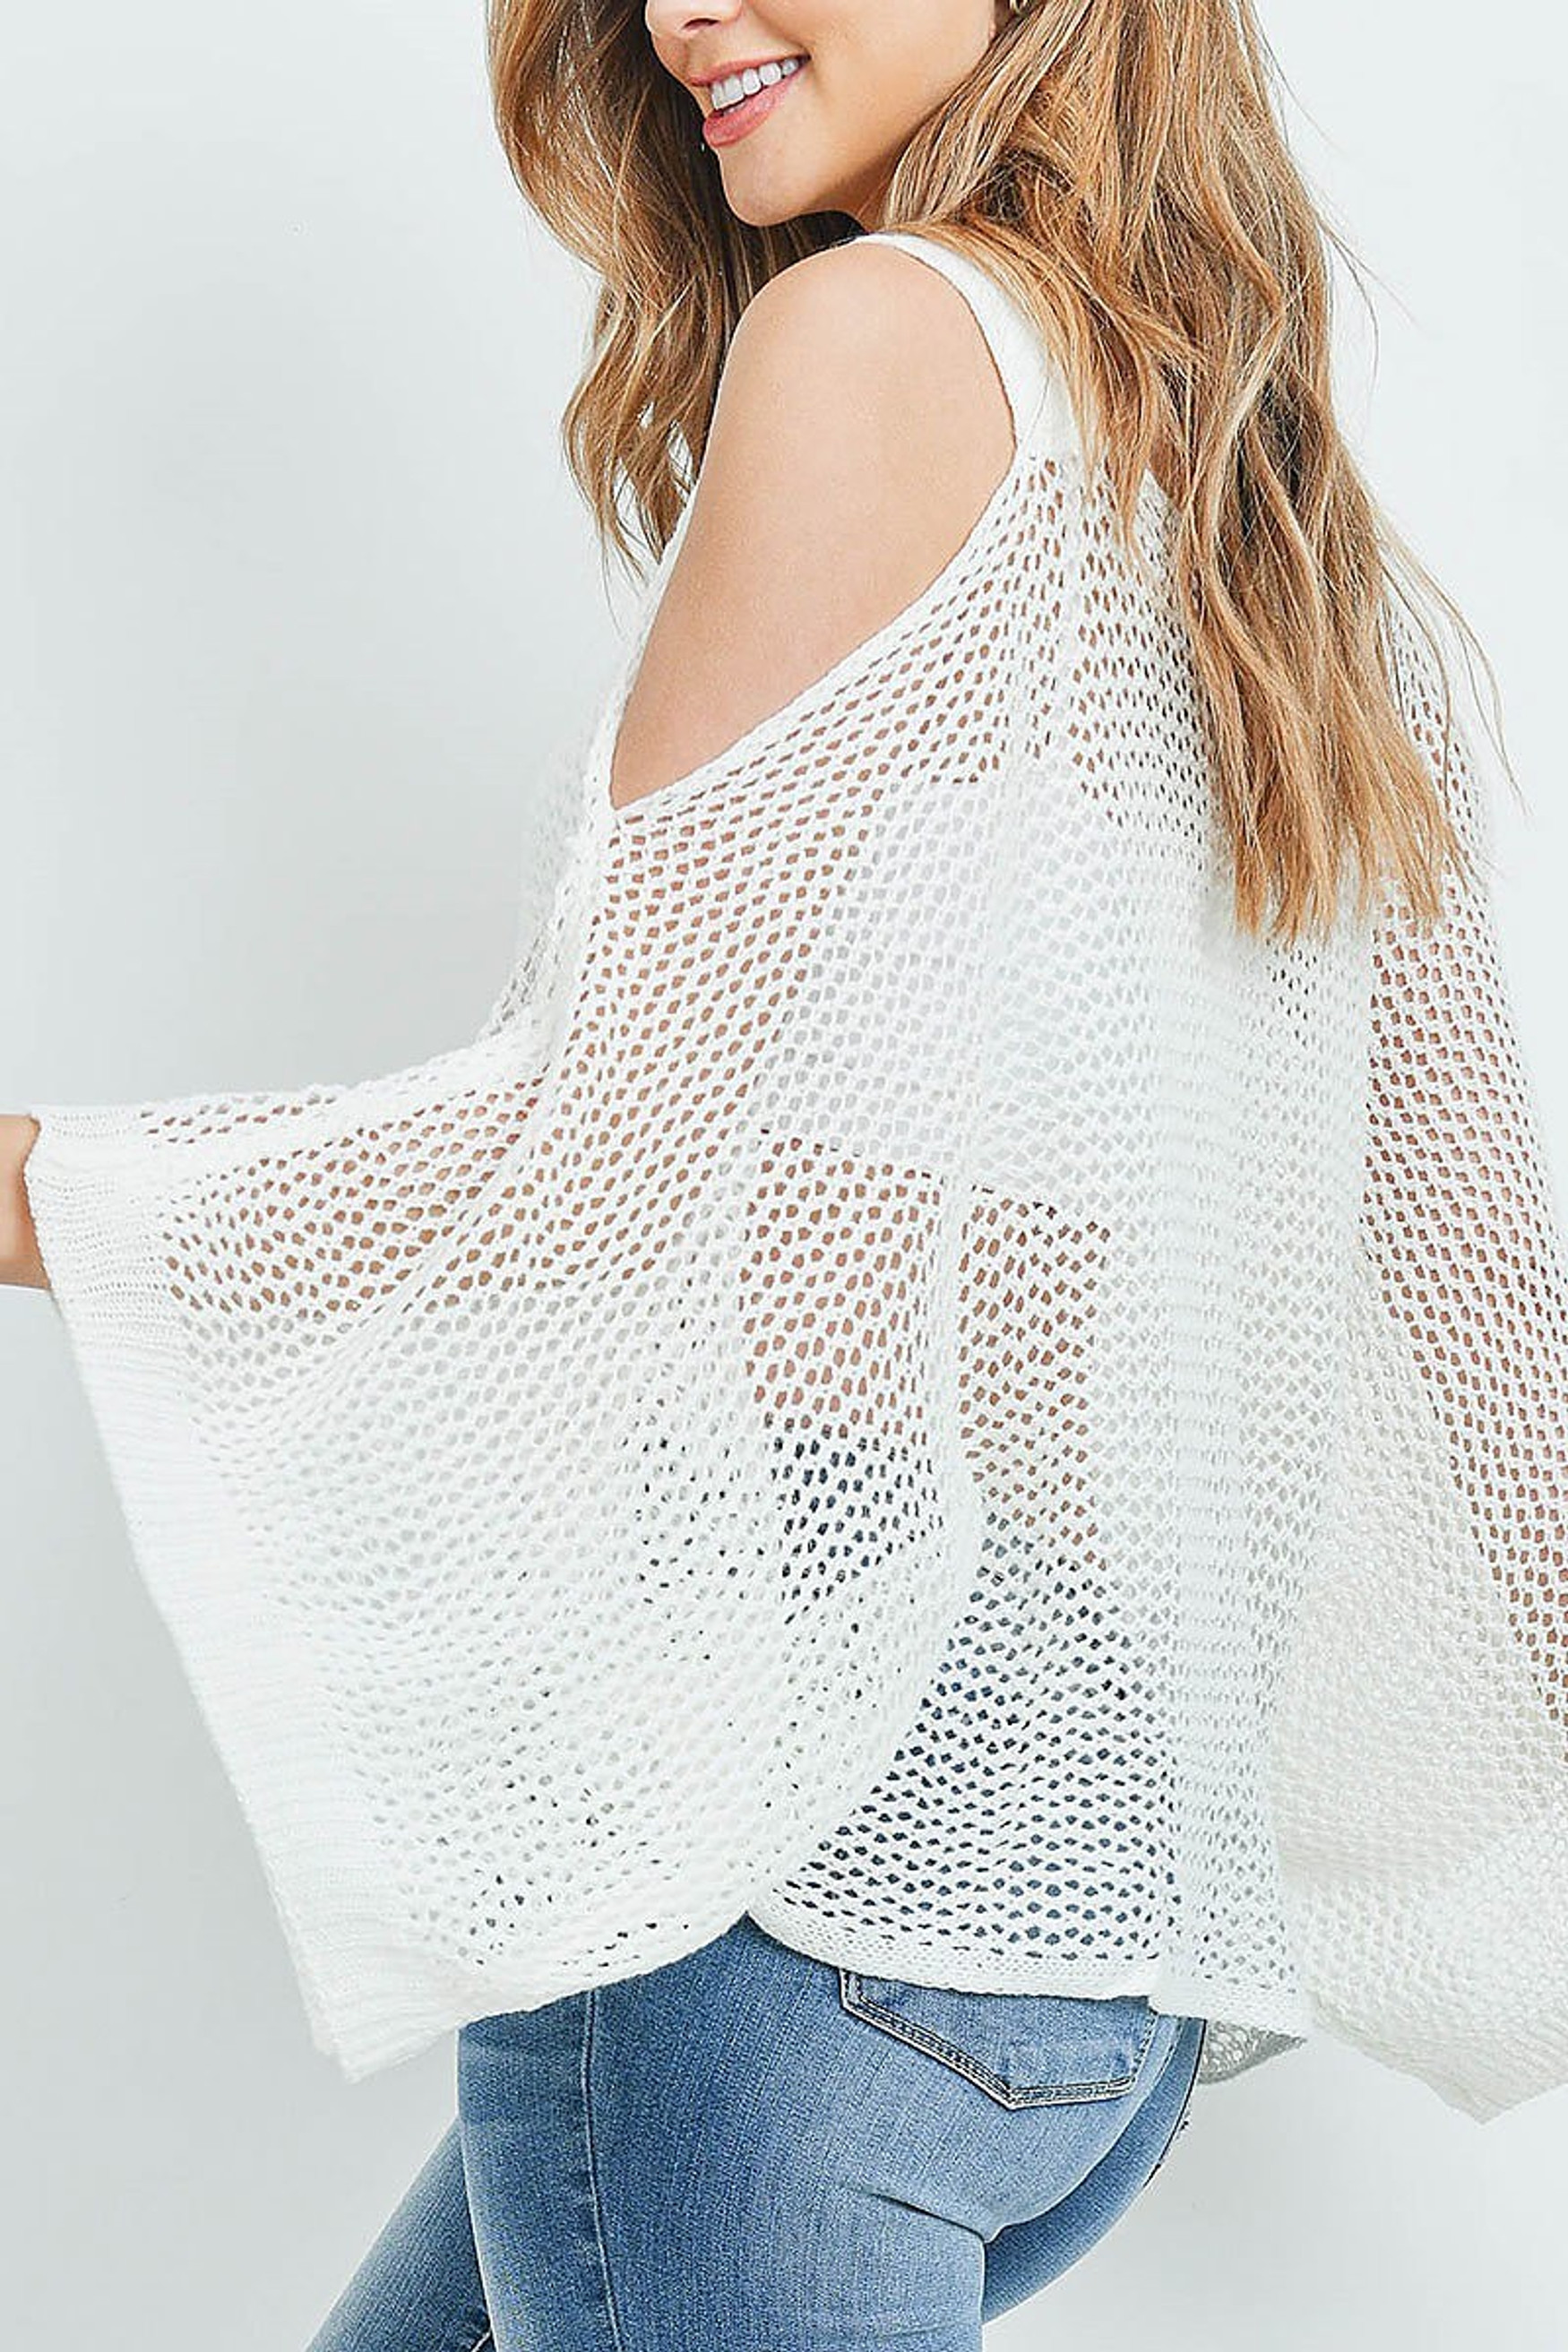 Off WhiteCrochet Wide Sleeve Cold Shoulder Top